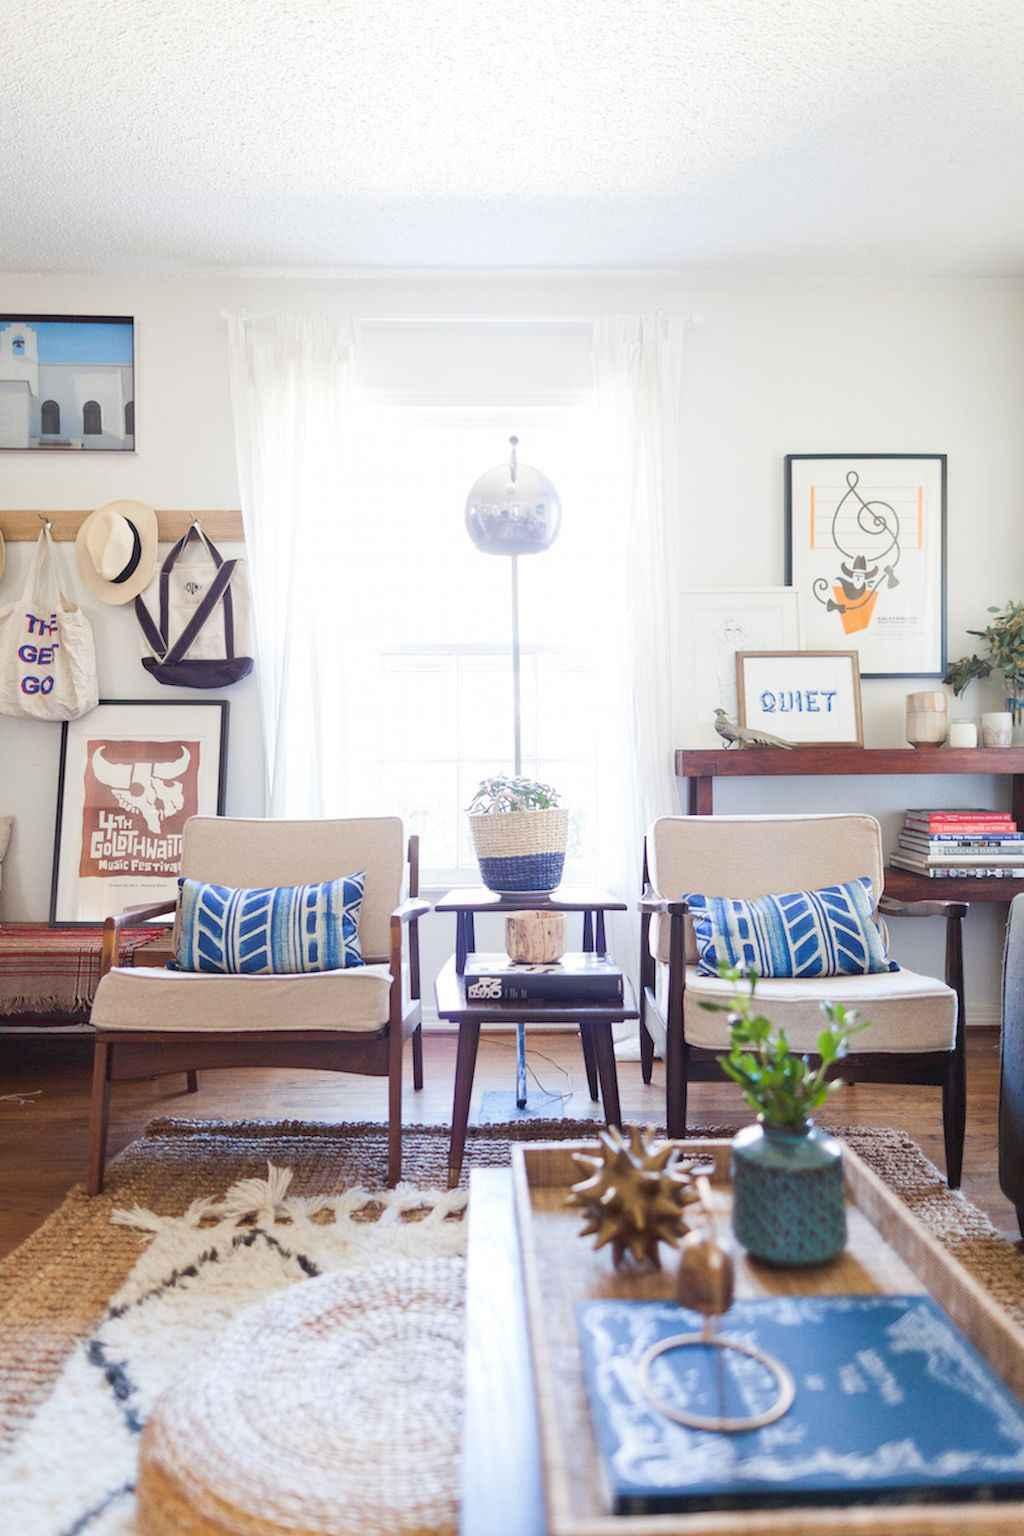 Modern Bohemian Living Room Decor Ideas 45 Homespecially